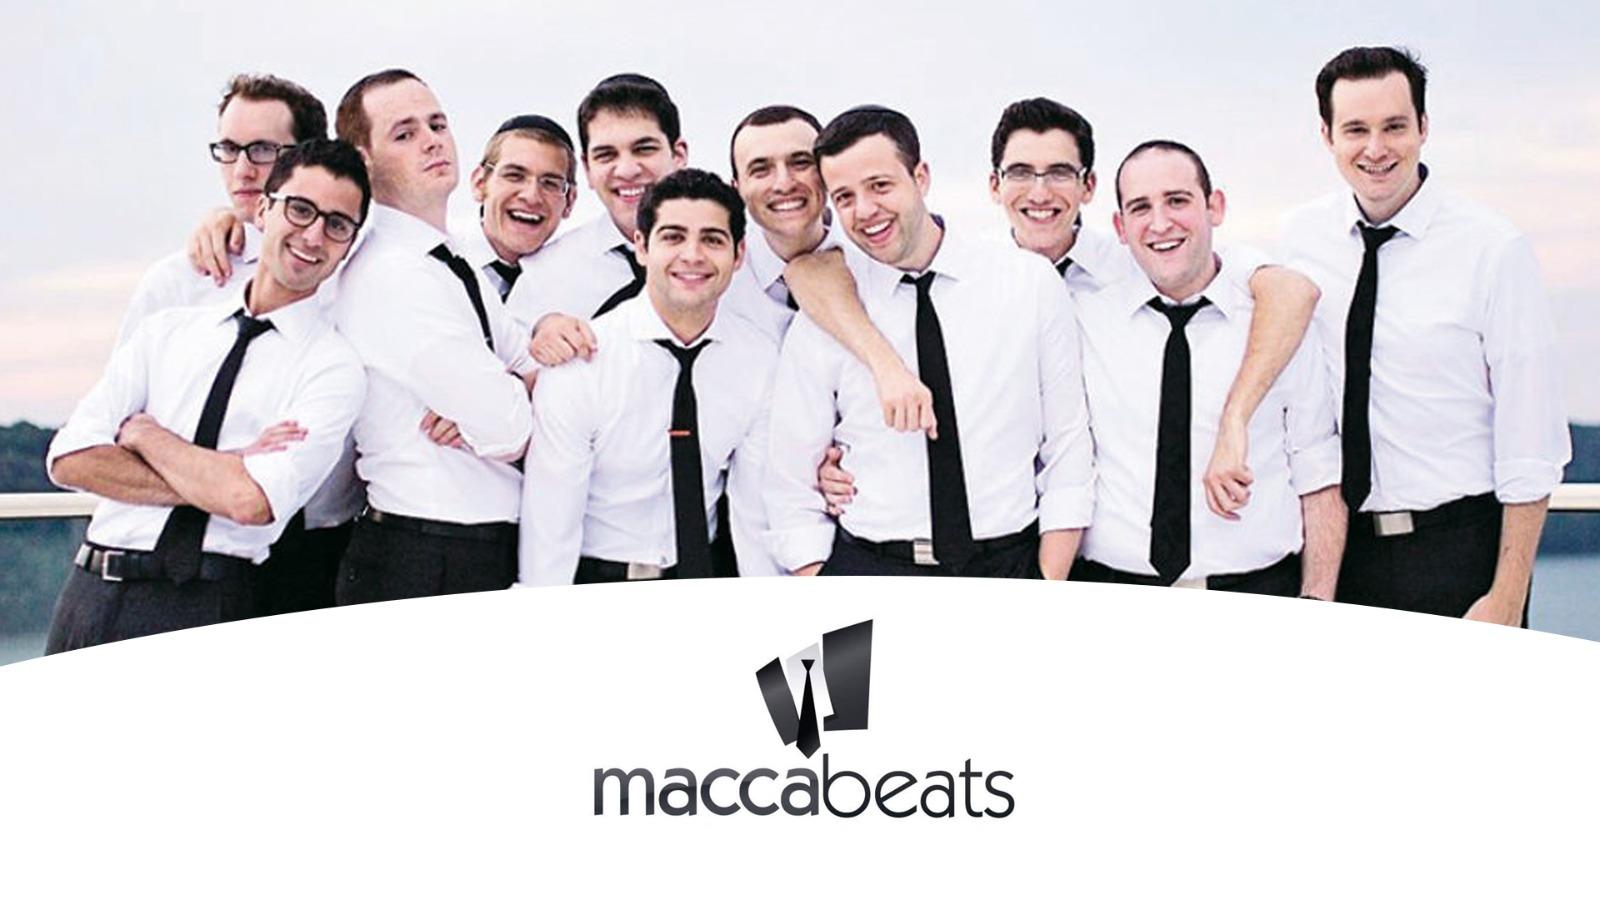 The Maccabeats